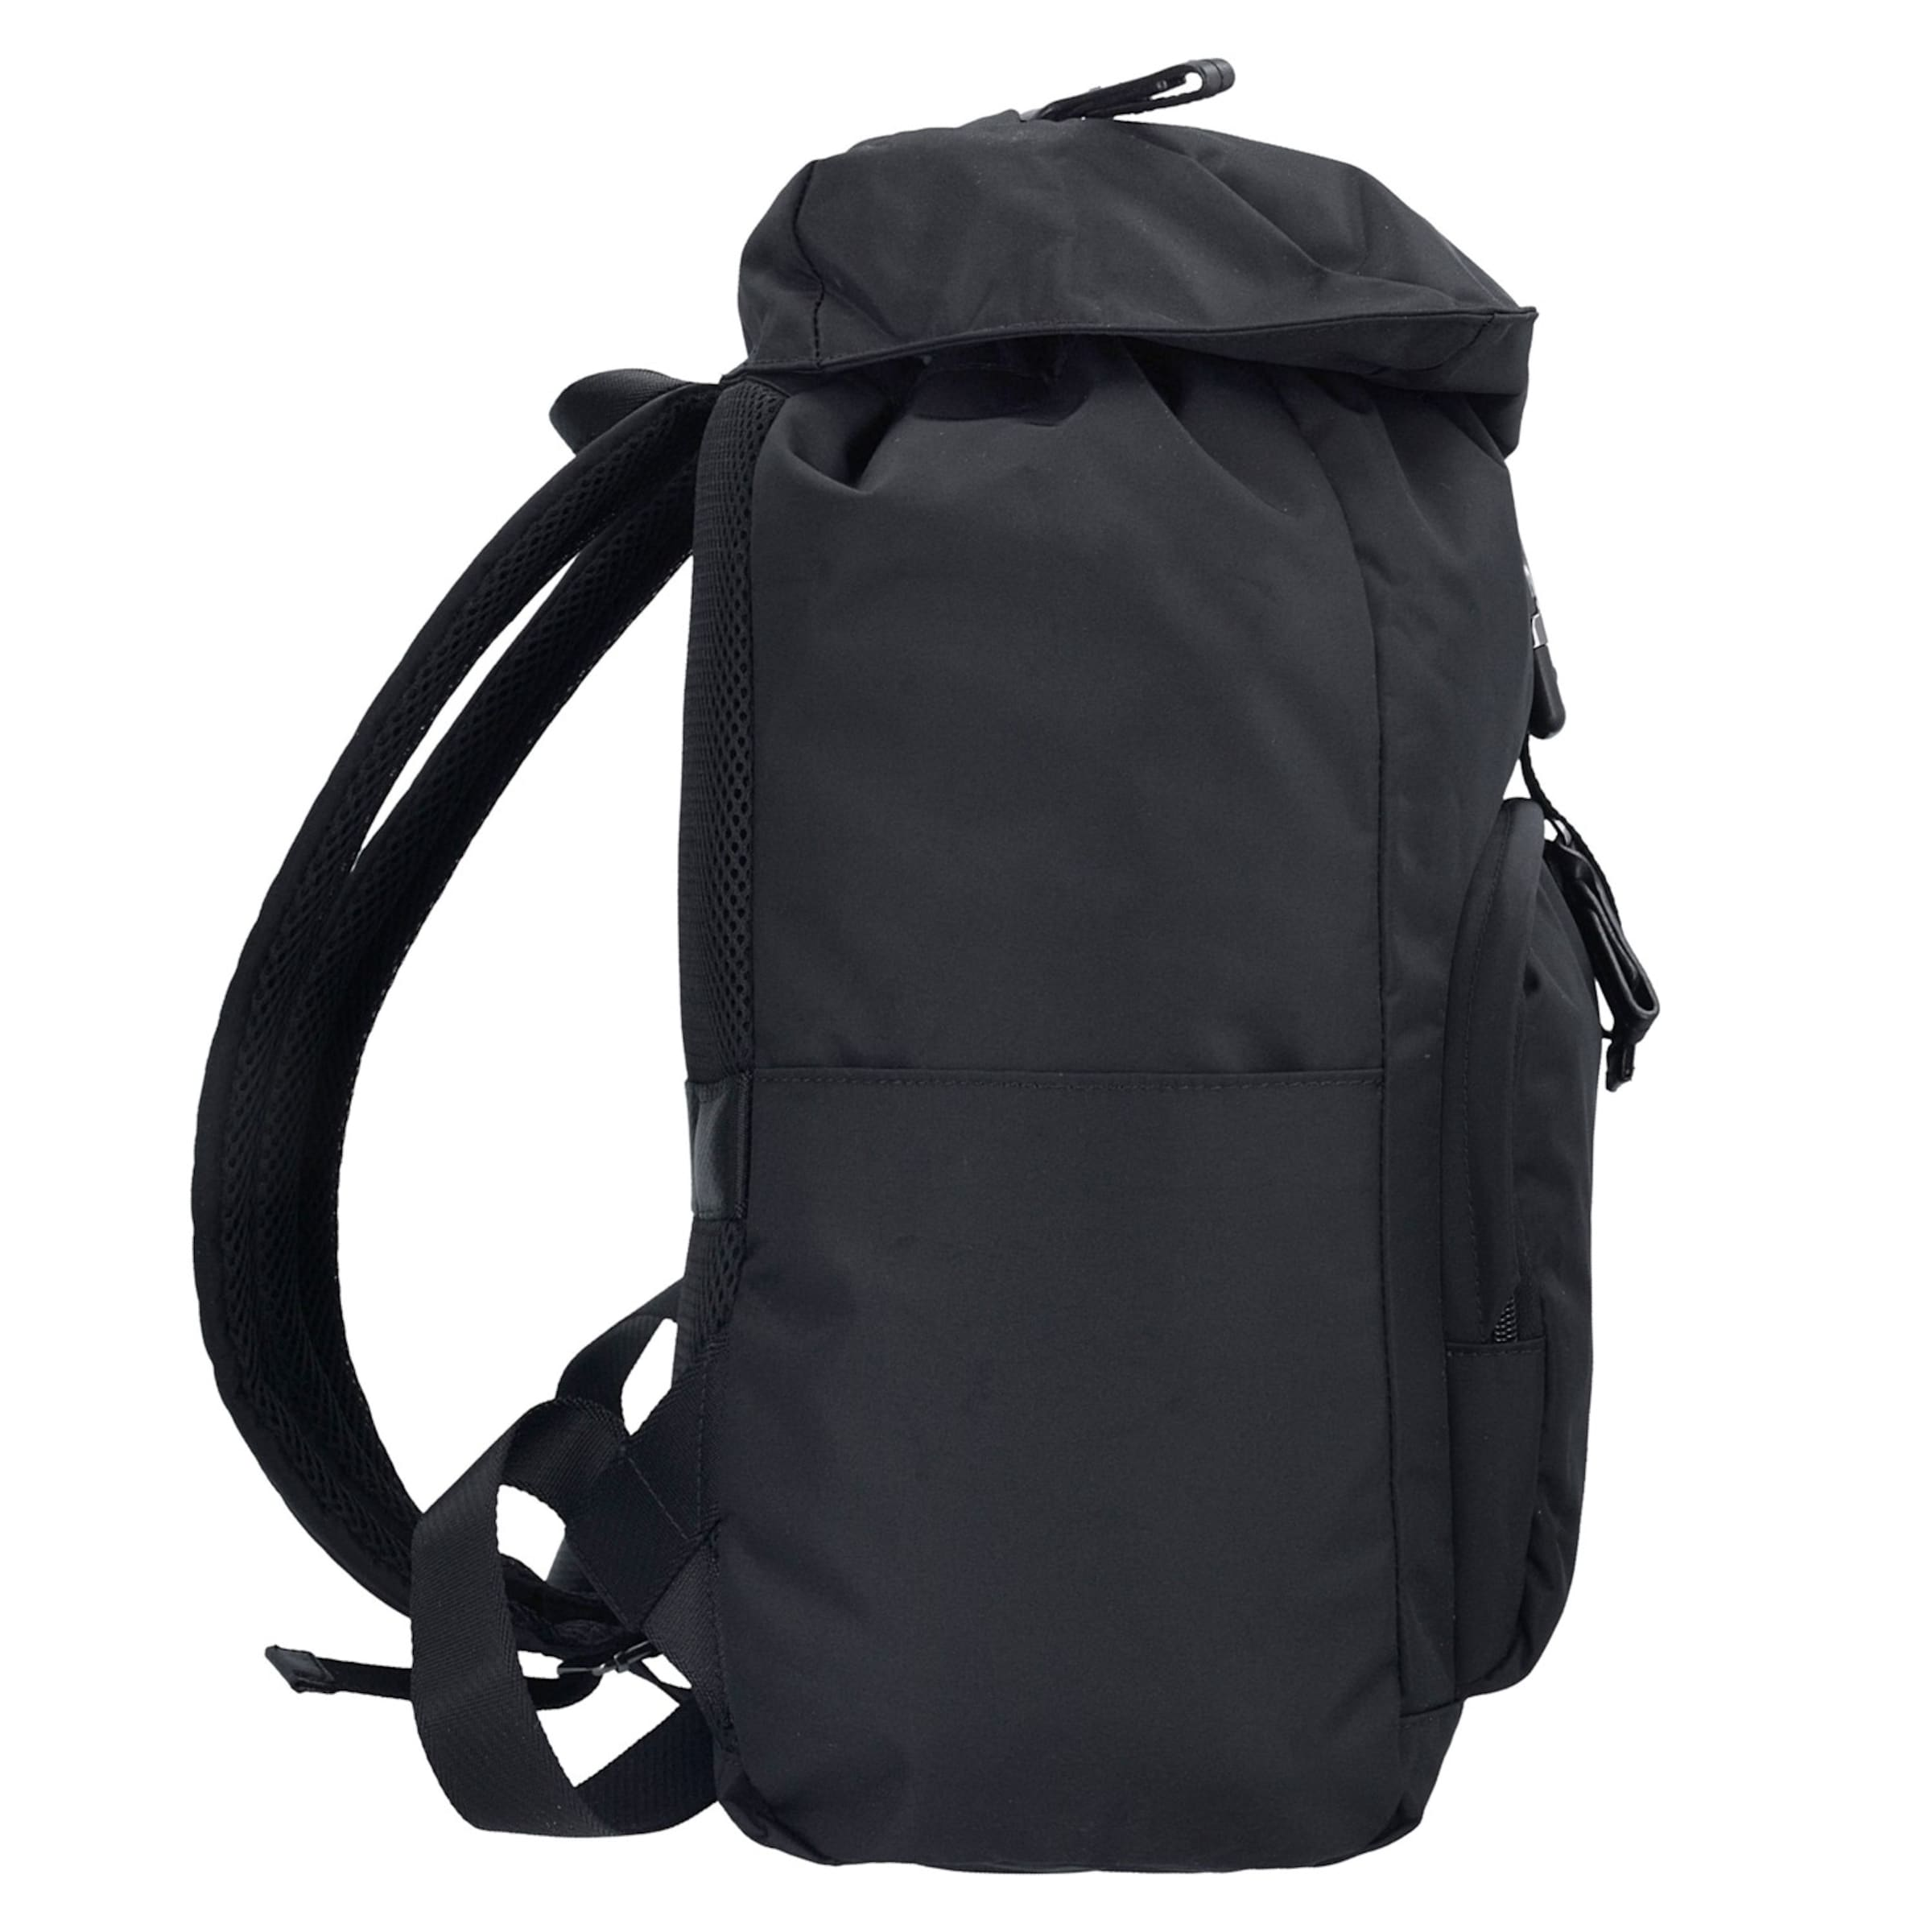 cm Bric Ruecksack 39 X Bric Travel Ruecksack X s Travel Laptopfach s FnxvUOv